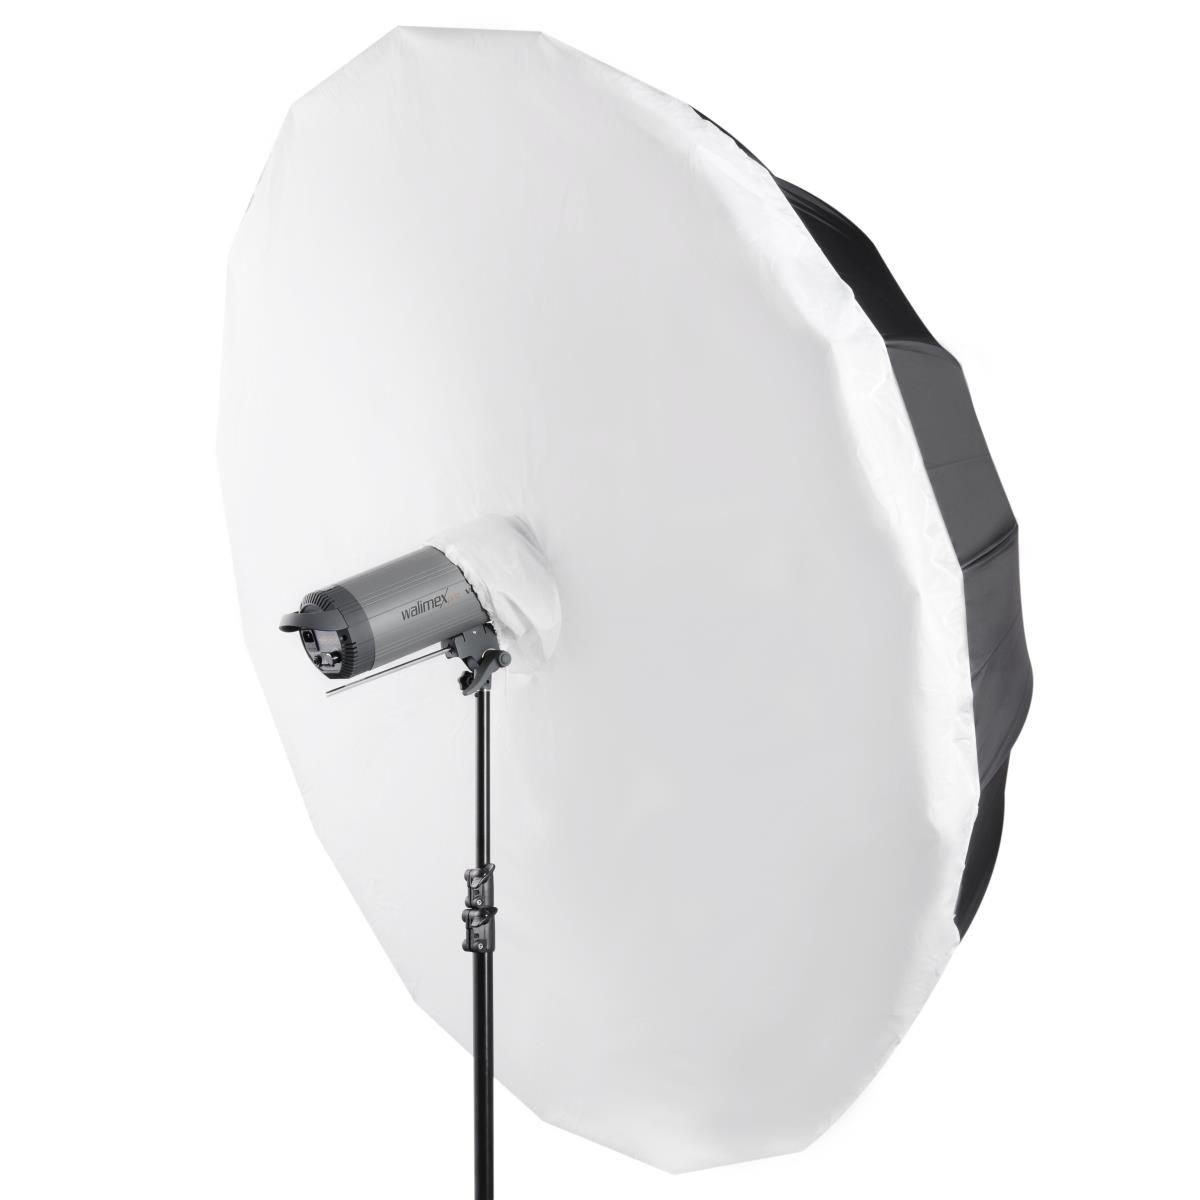 Walimex pro Reflexschirmdiffusor weiß, Ø180cm